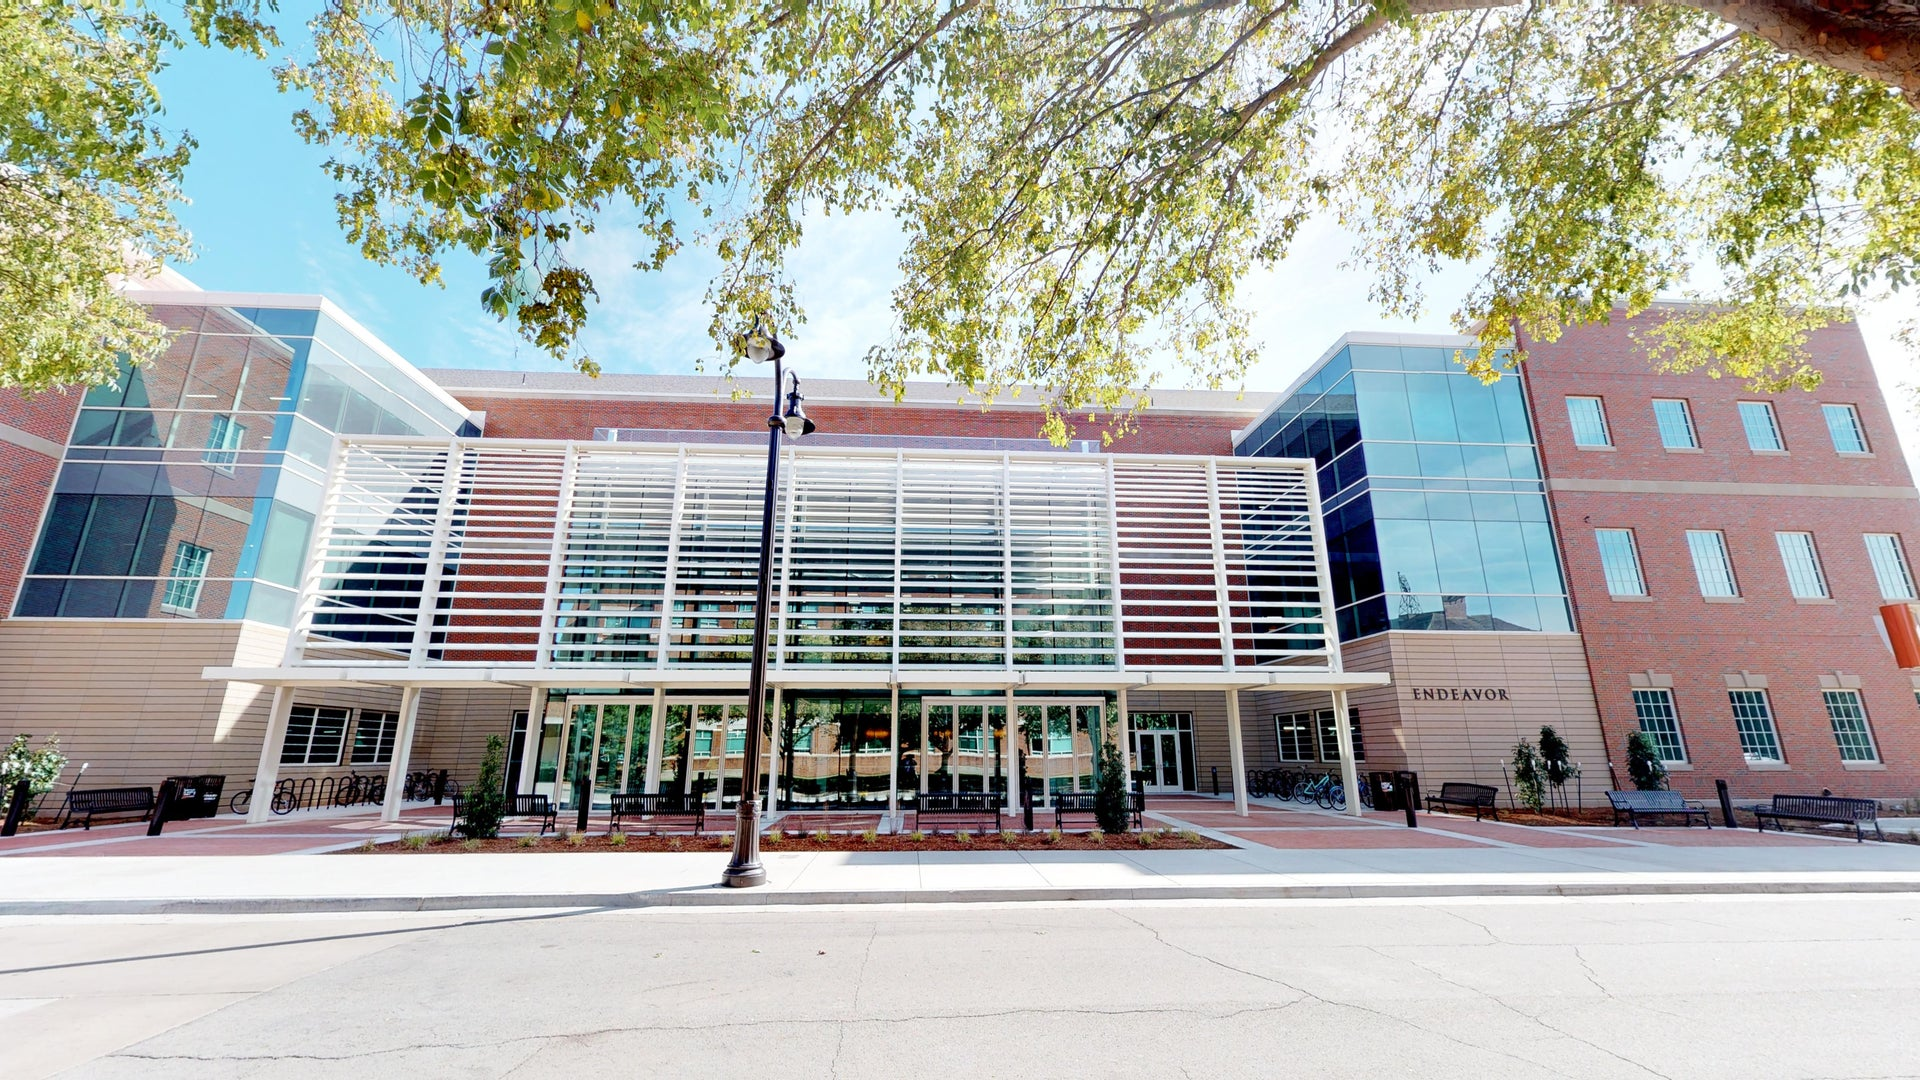 Oklahoma State University School of Engineering (Endeavor)